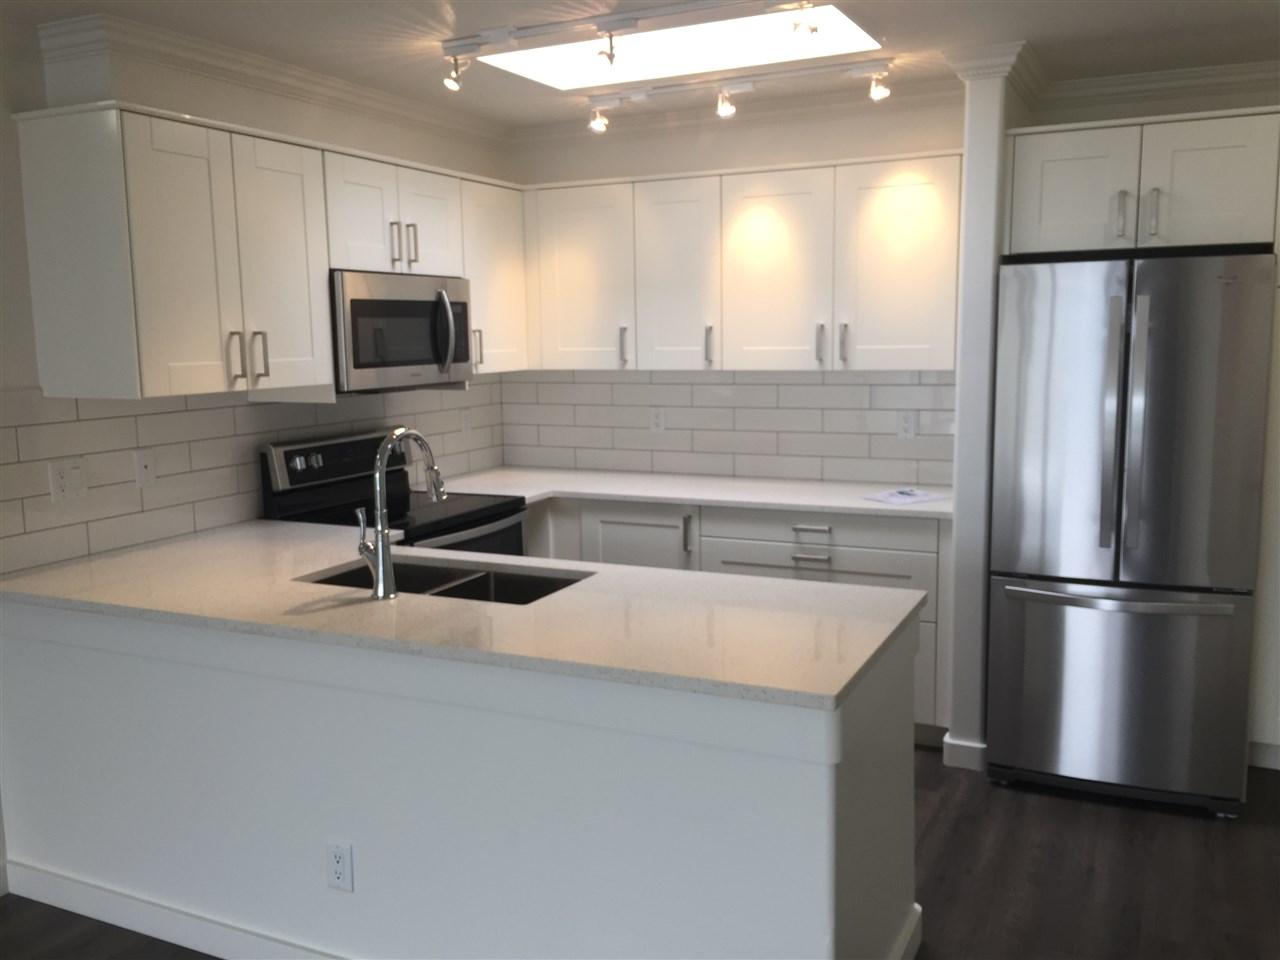 Condo Apartment at 312 1119 VIDAL STREET, Unit 312, South Surrey White Rock, British Columbia. Image 2